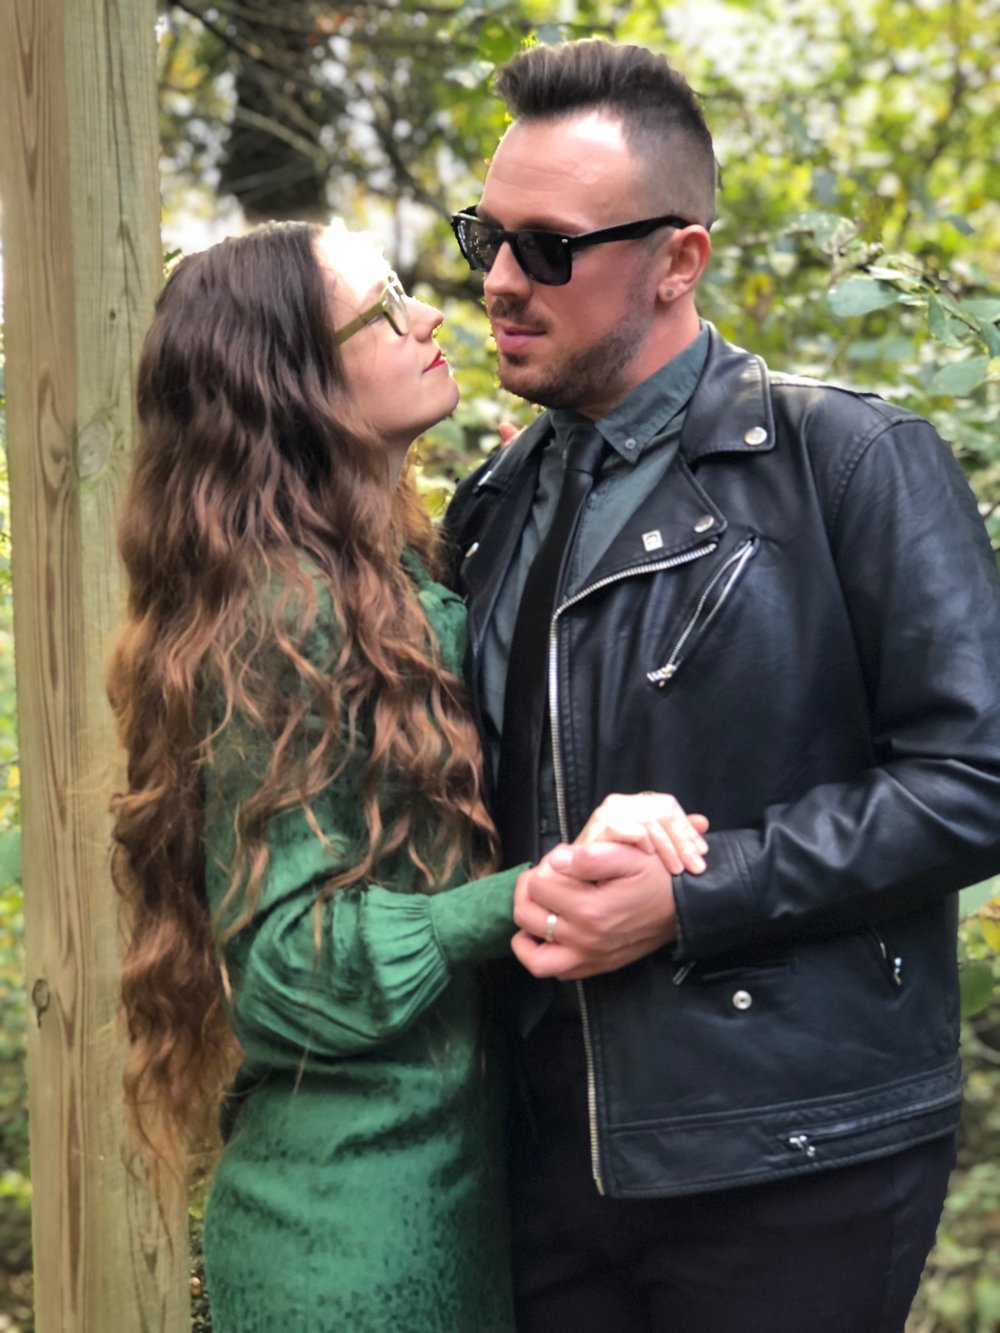 My dear friend Bobby in a leather jacket